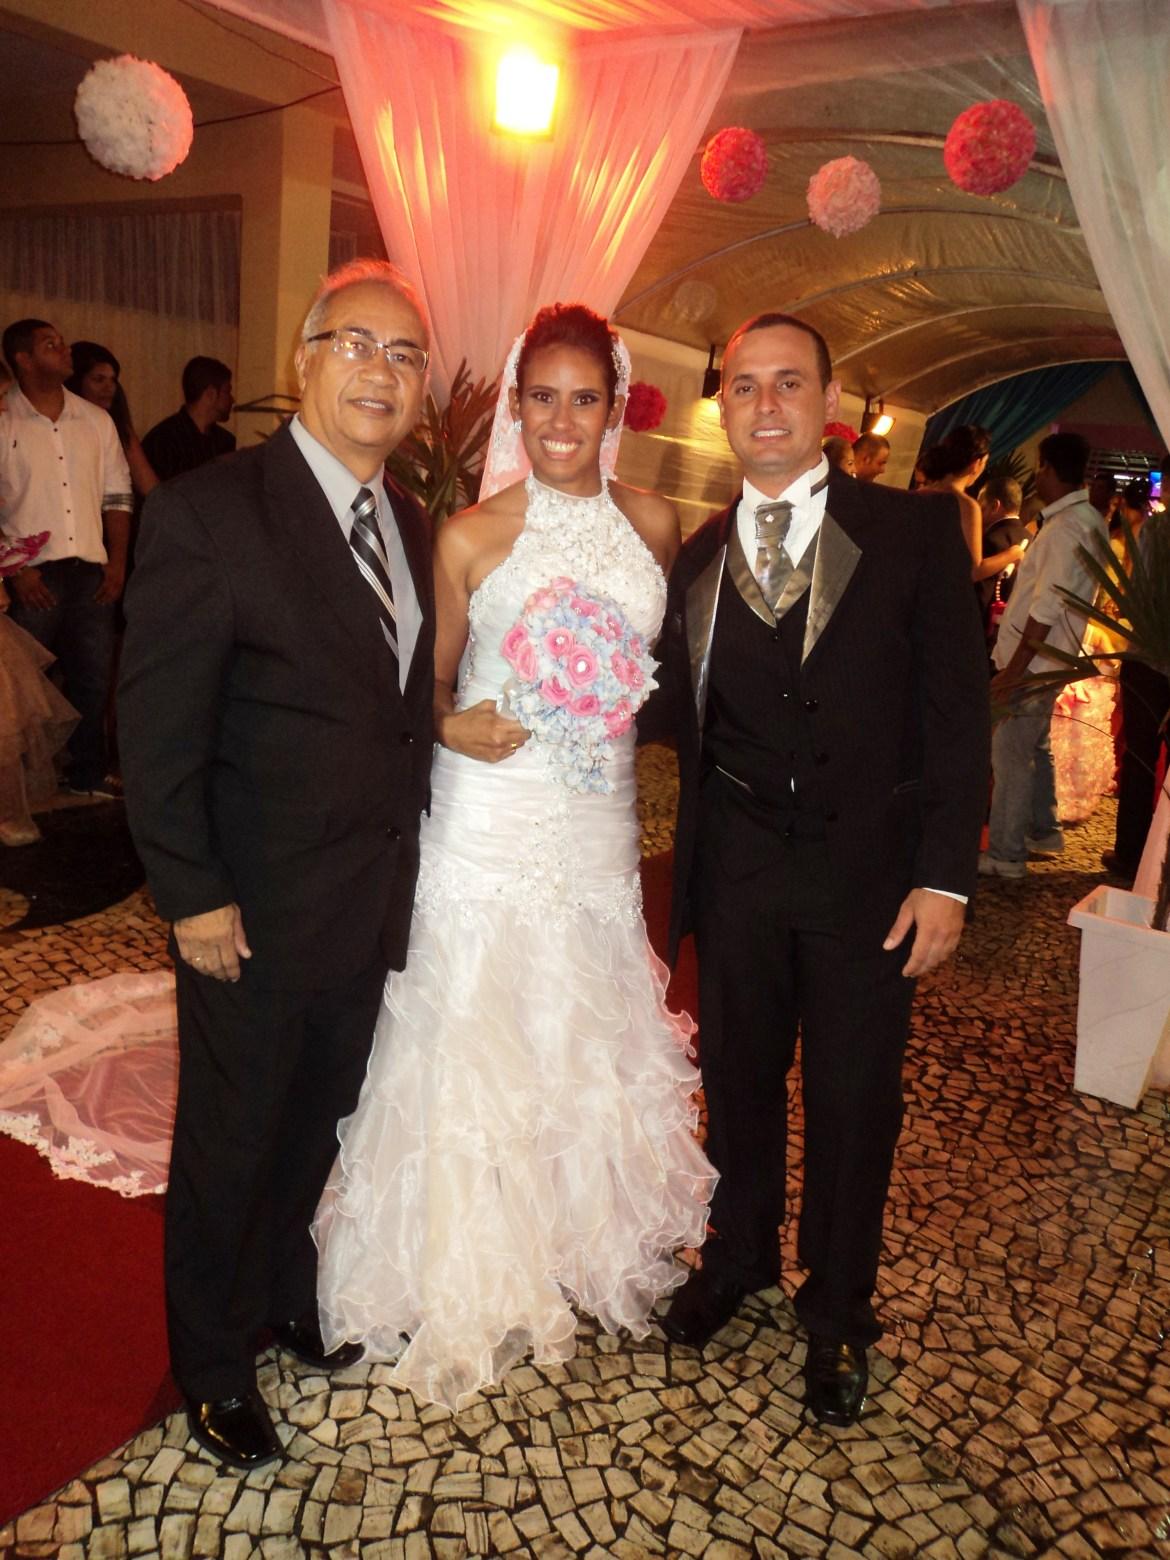 Foto Túlio com noivos Renata e Lesley